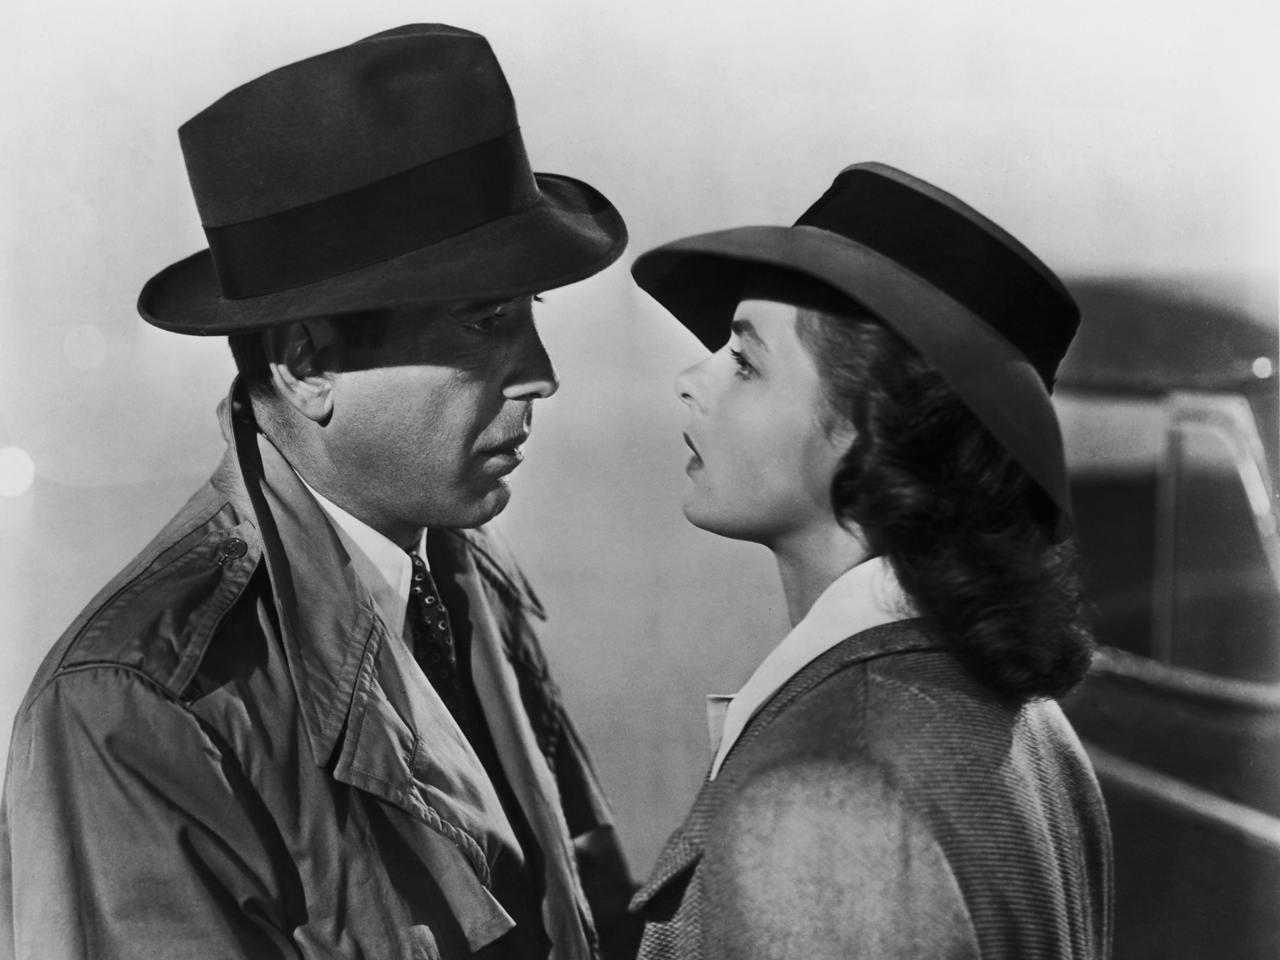 Humphrey Bogart and Ingrid Bergman talking in Casablanca.